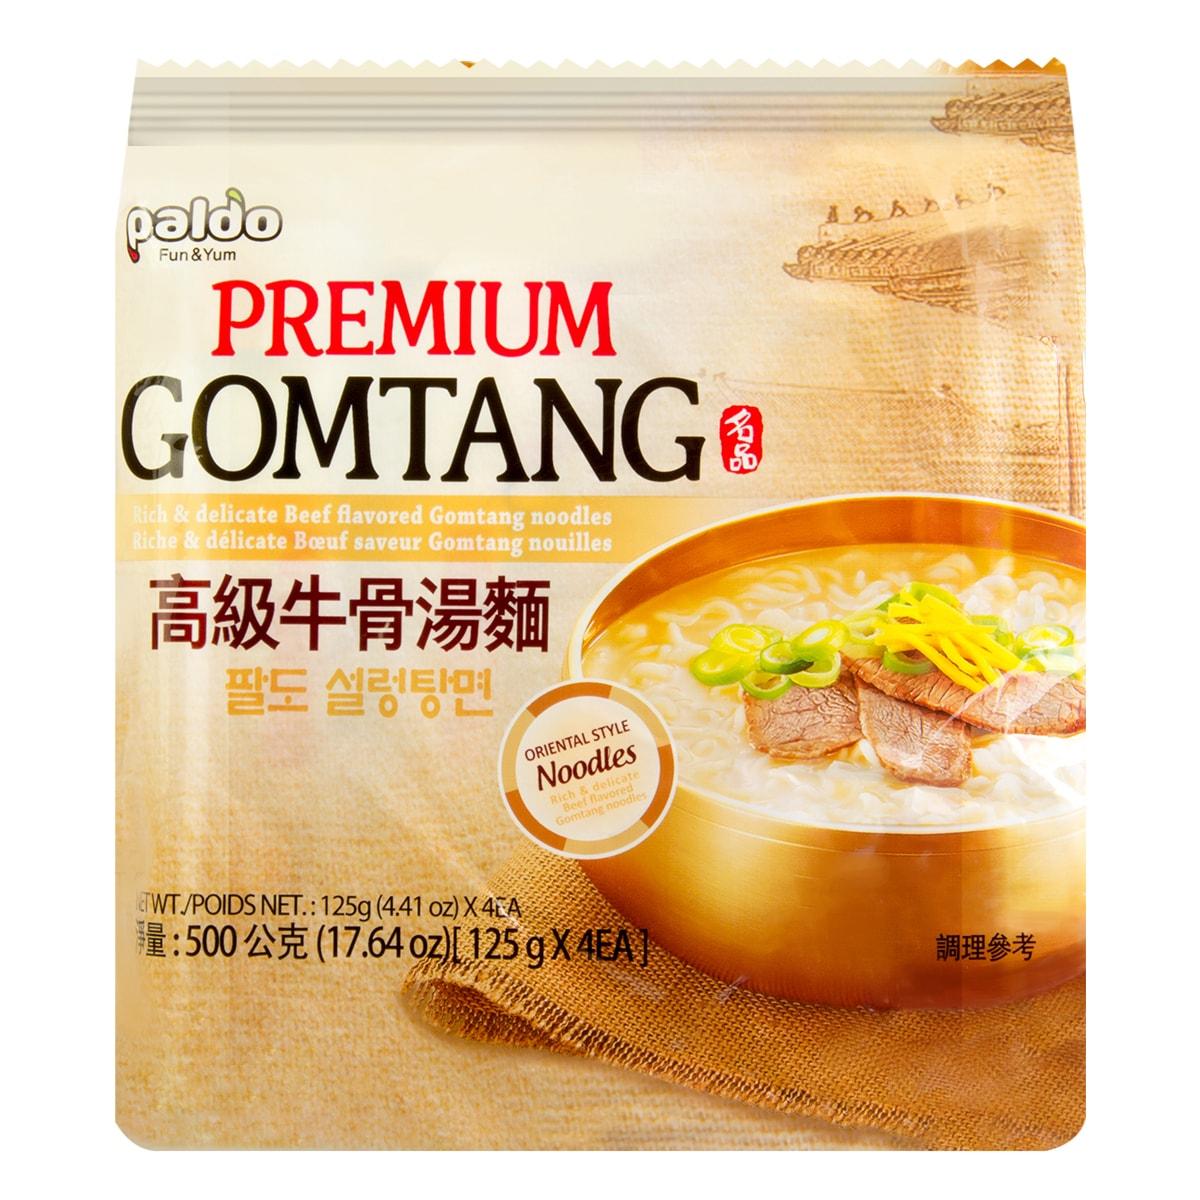 PALDO Premium Gomtang 4 Packs